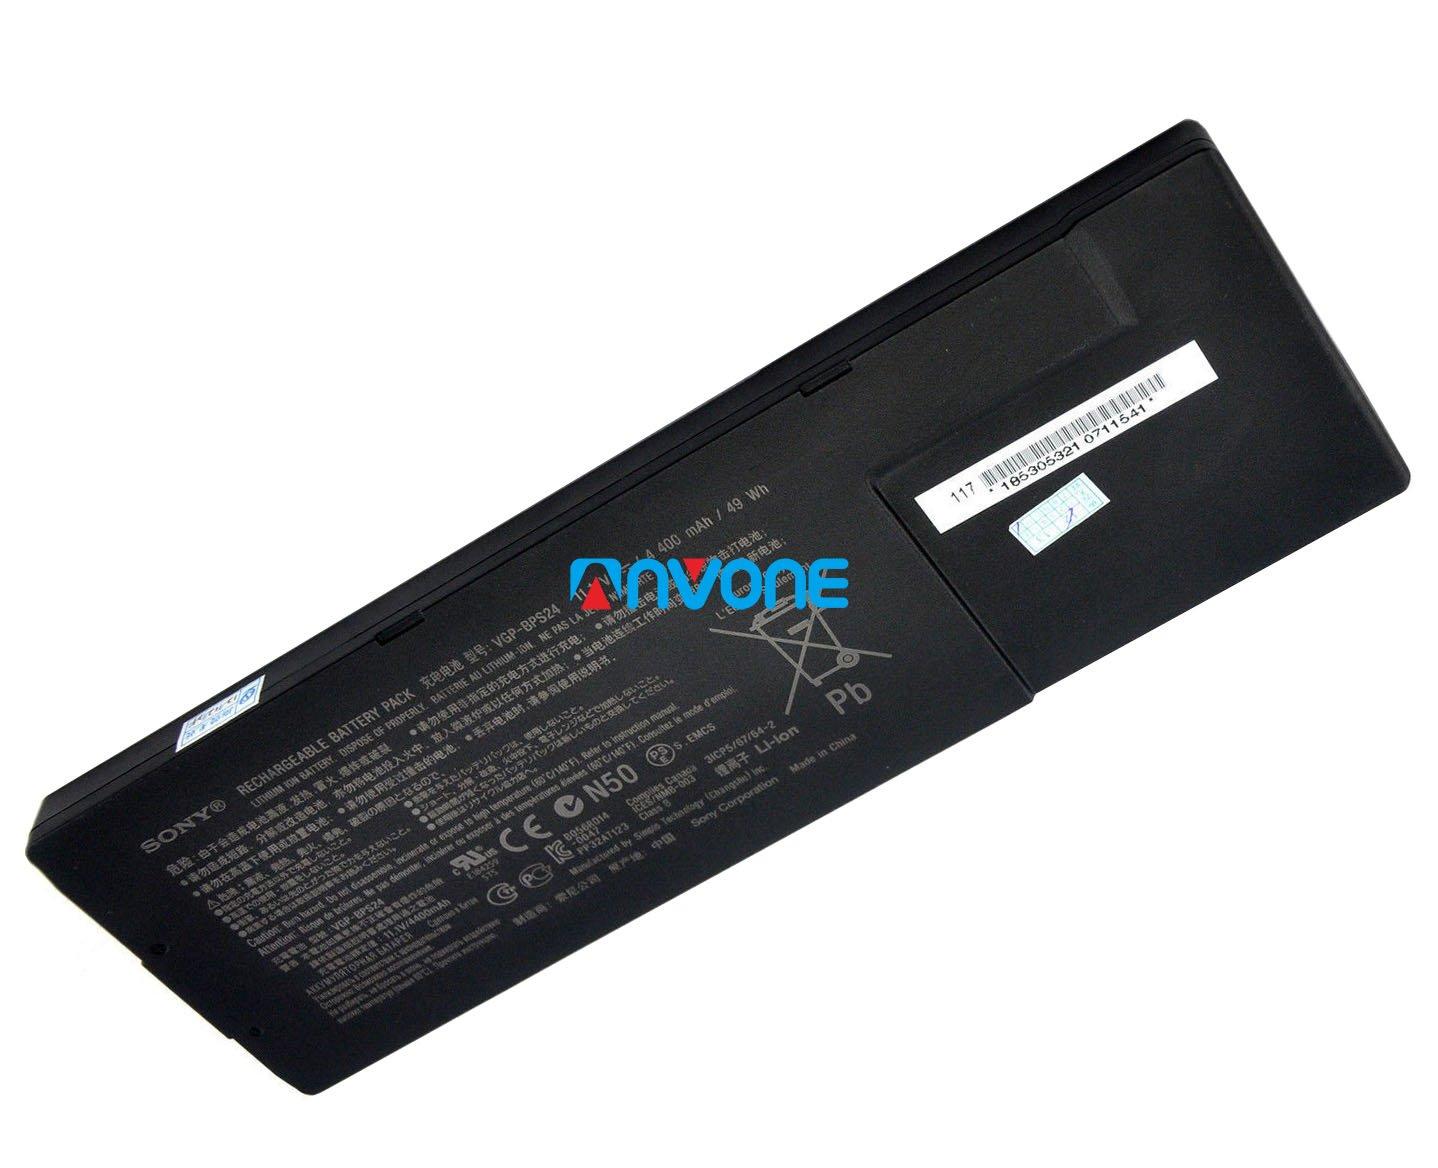 VGP-BPS24 Genuine Sony VAIO VPC-SB37GG/S VPC-SB37GH/B VPC-SB37GW/S VPC-SB38FJ/B Battery